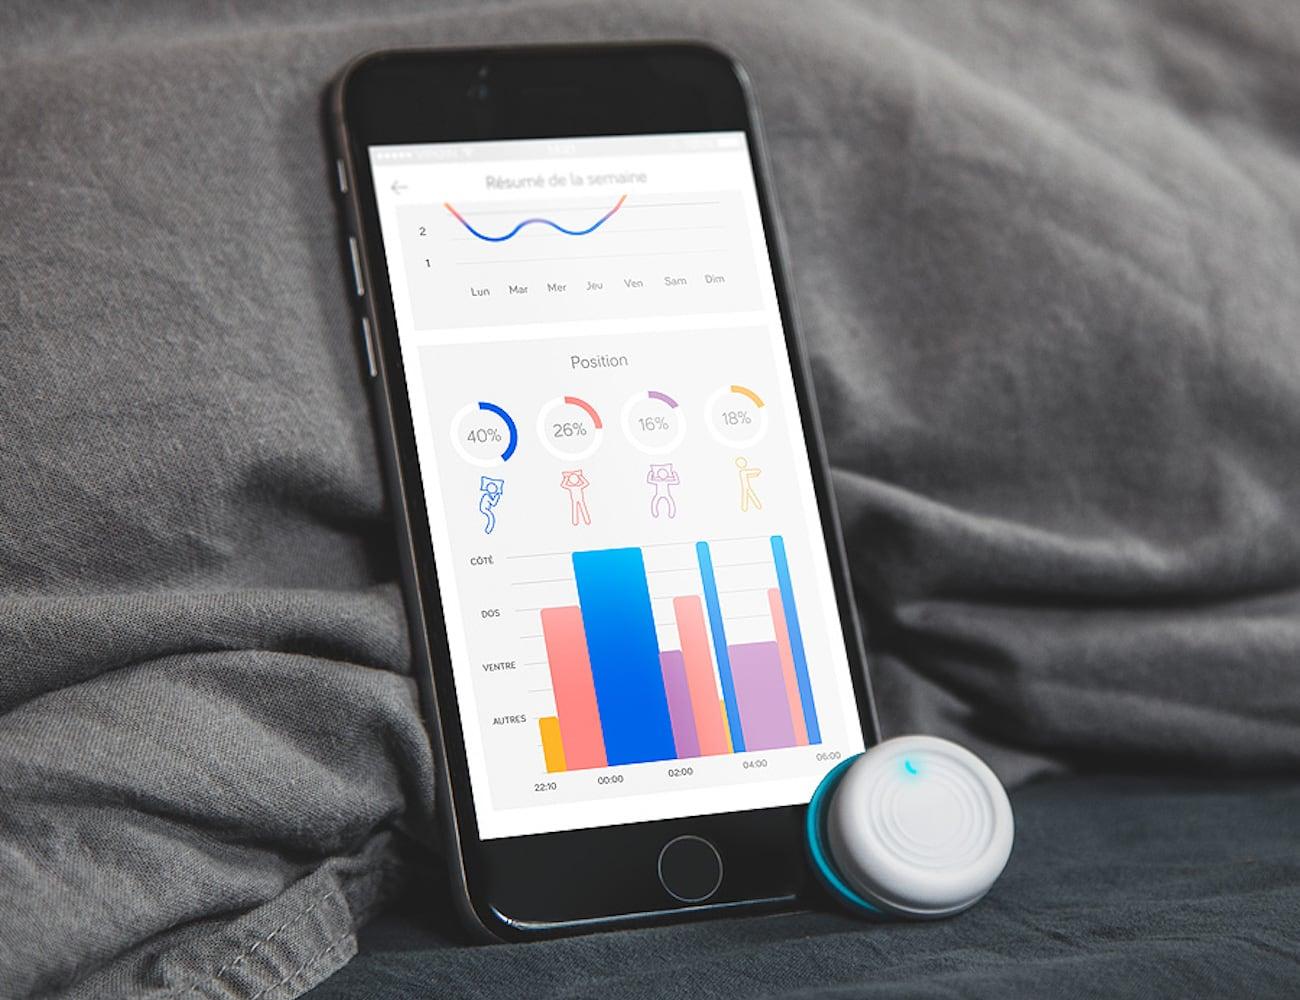 Holi SleepSensor Advanced Sleep Tracker